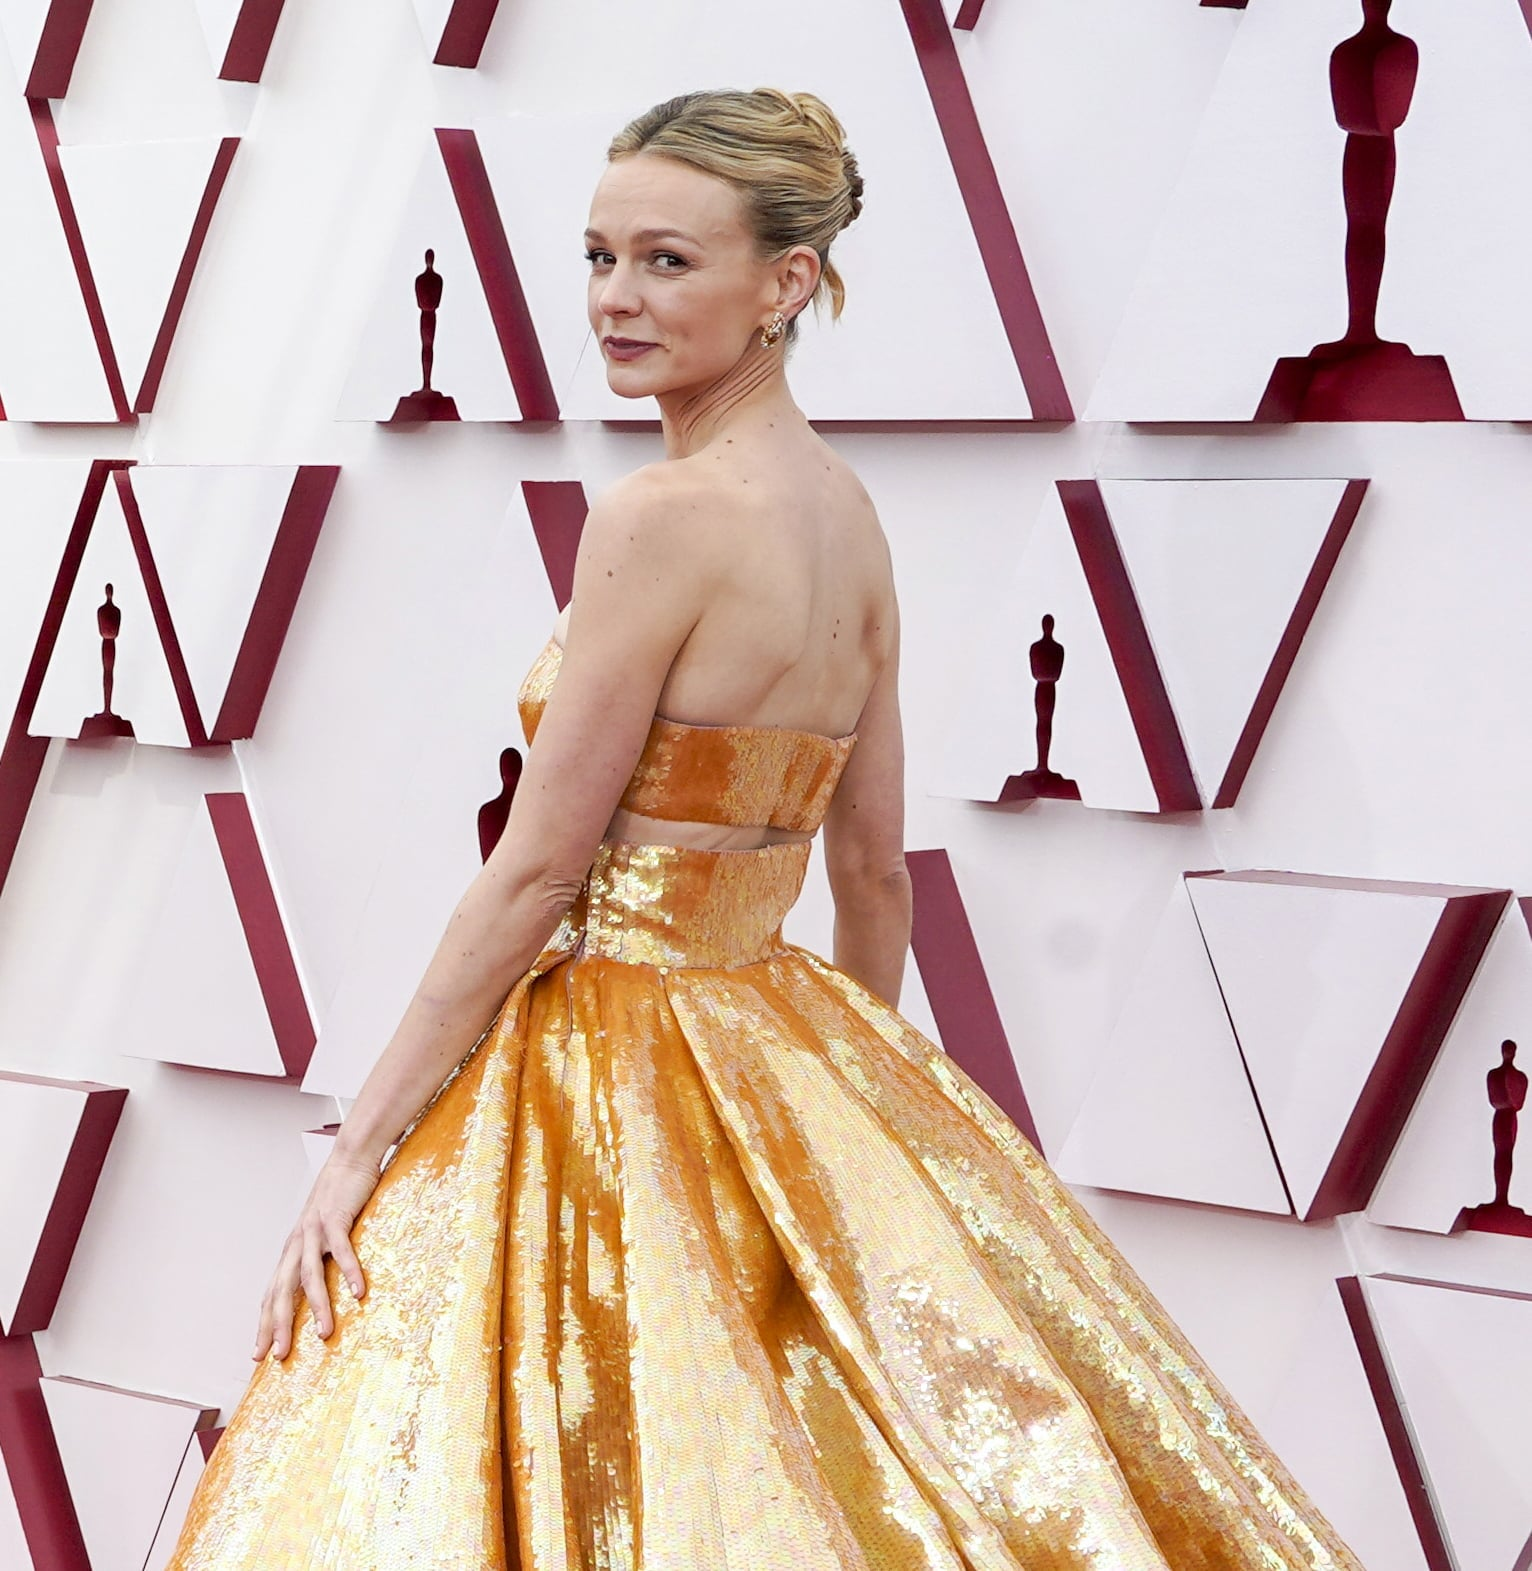 Carey Mulligan's Oscars Hairstyle Has a Hidden Detail | POPSUGAR Beauty